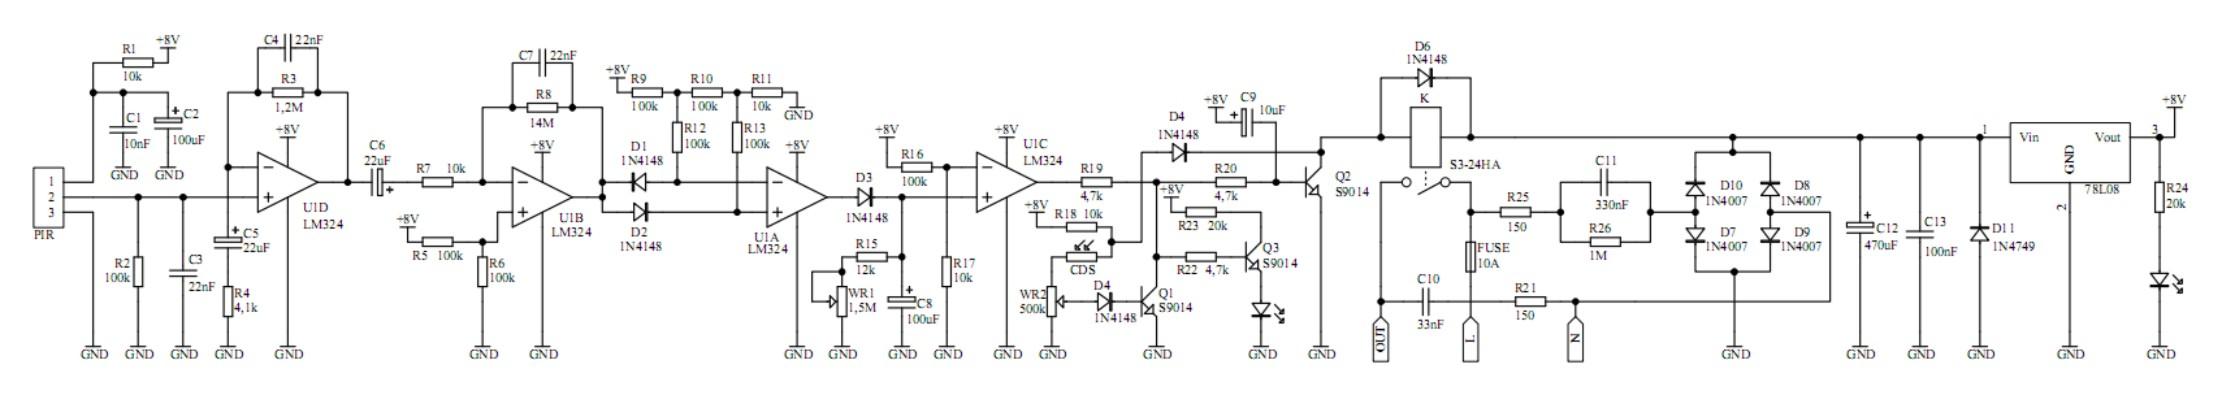 Zasada Dziaania Czujnika Ruchu Pir Sensor Circuit Diagram Using Lm324